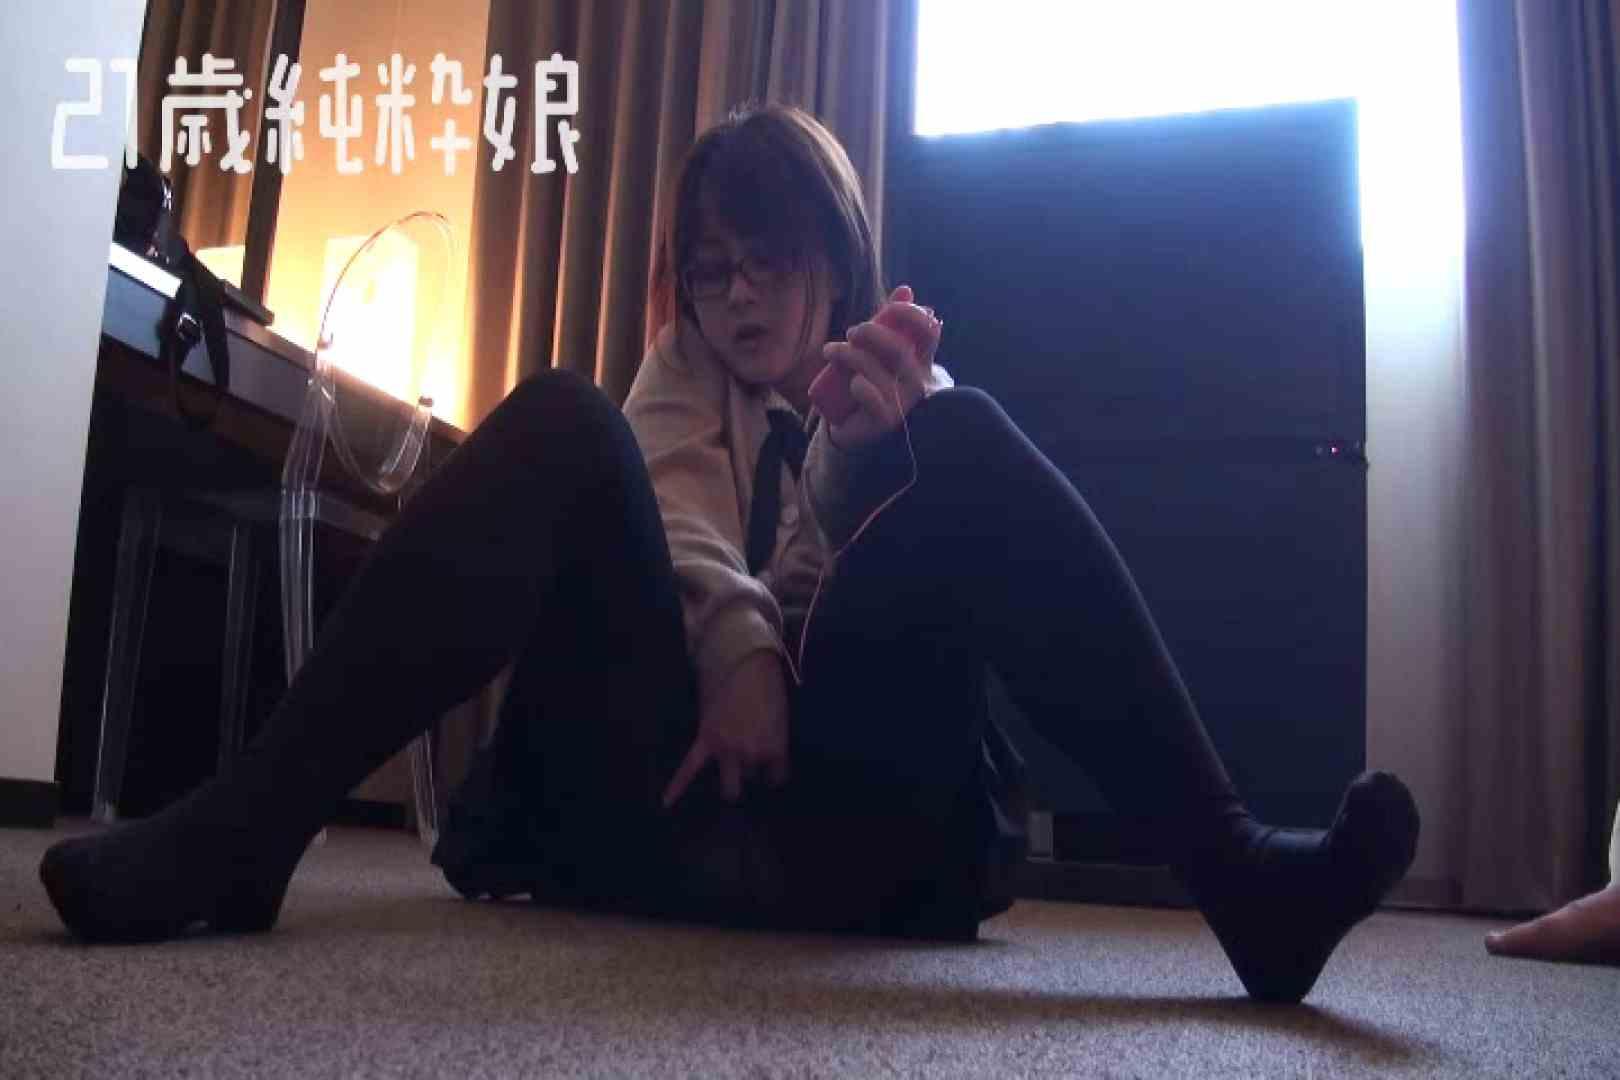 Gカップ21歳純粋嬢第2弾Vol.3 美女OL  95連発 4